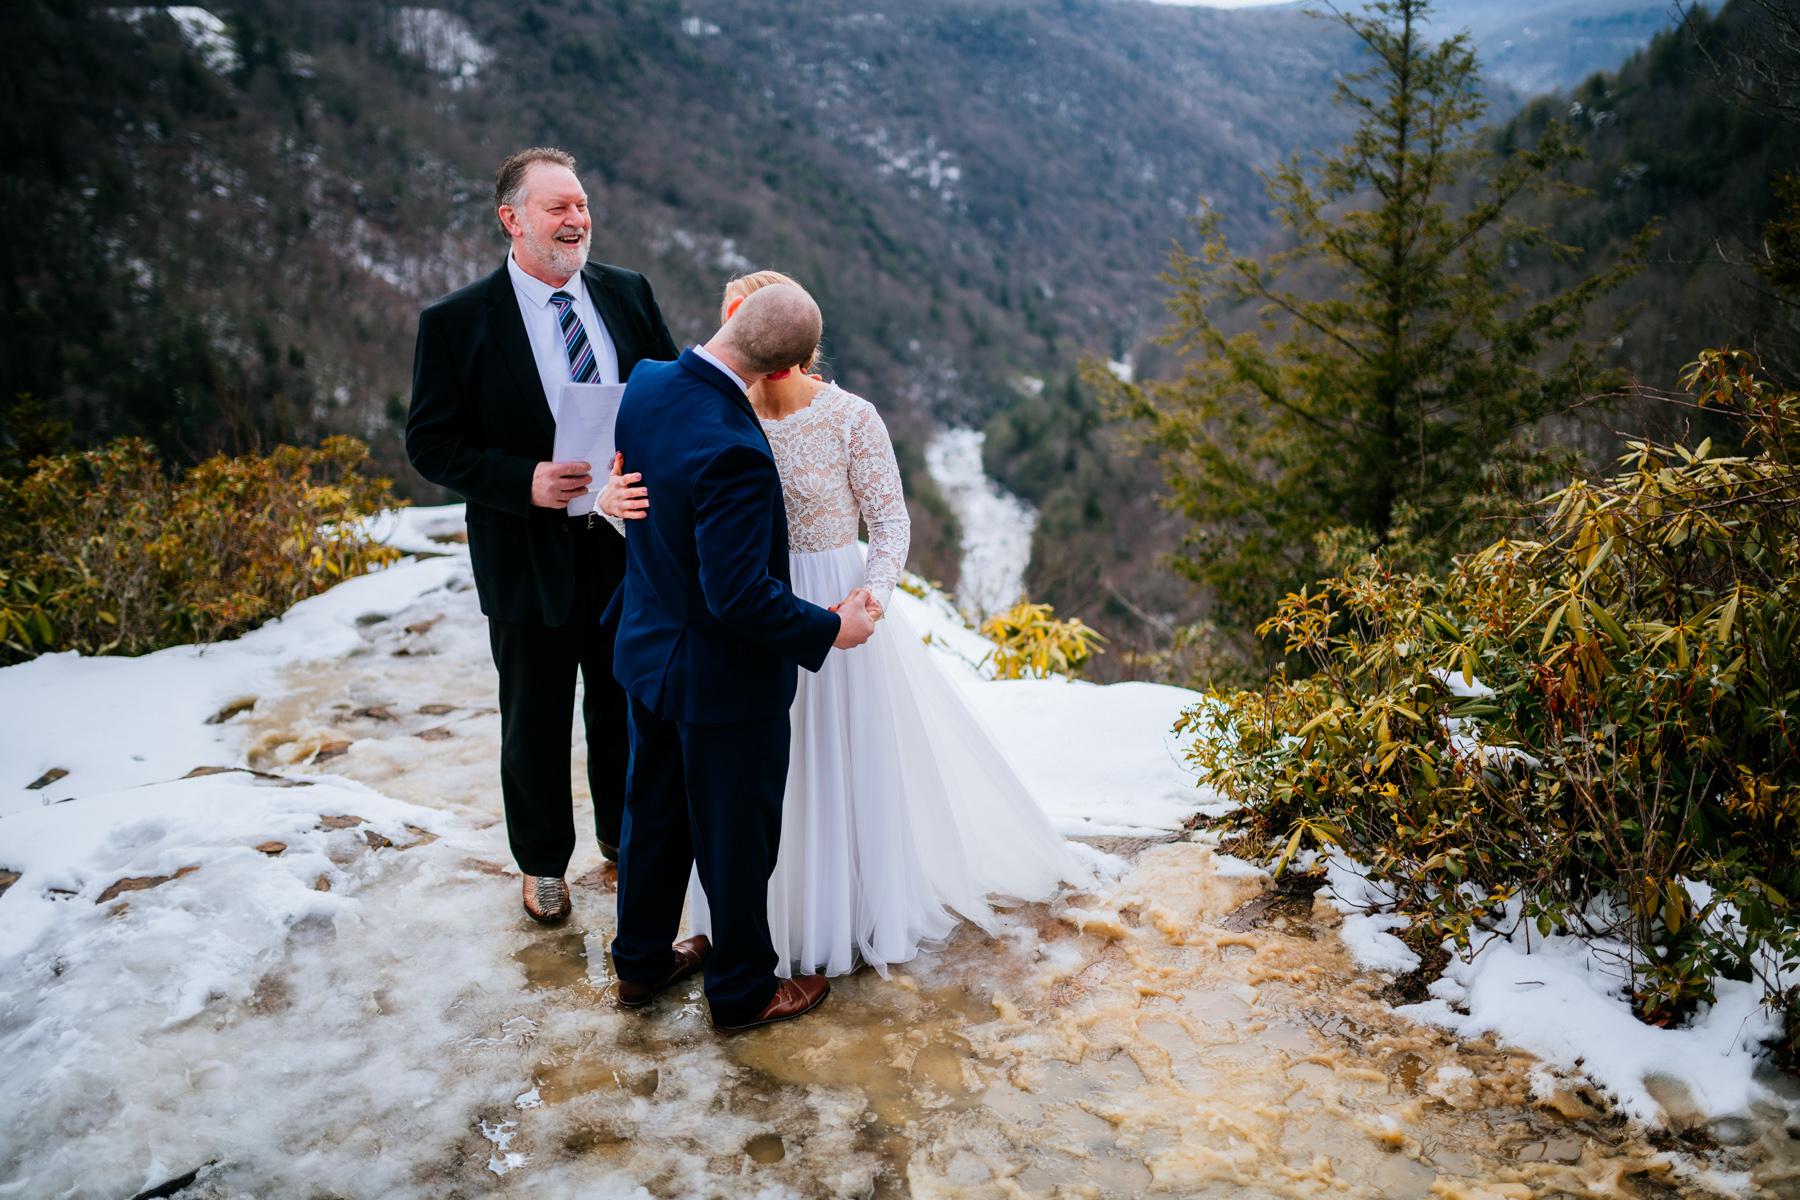 pendleton point wedding ceremony first kiss